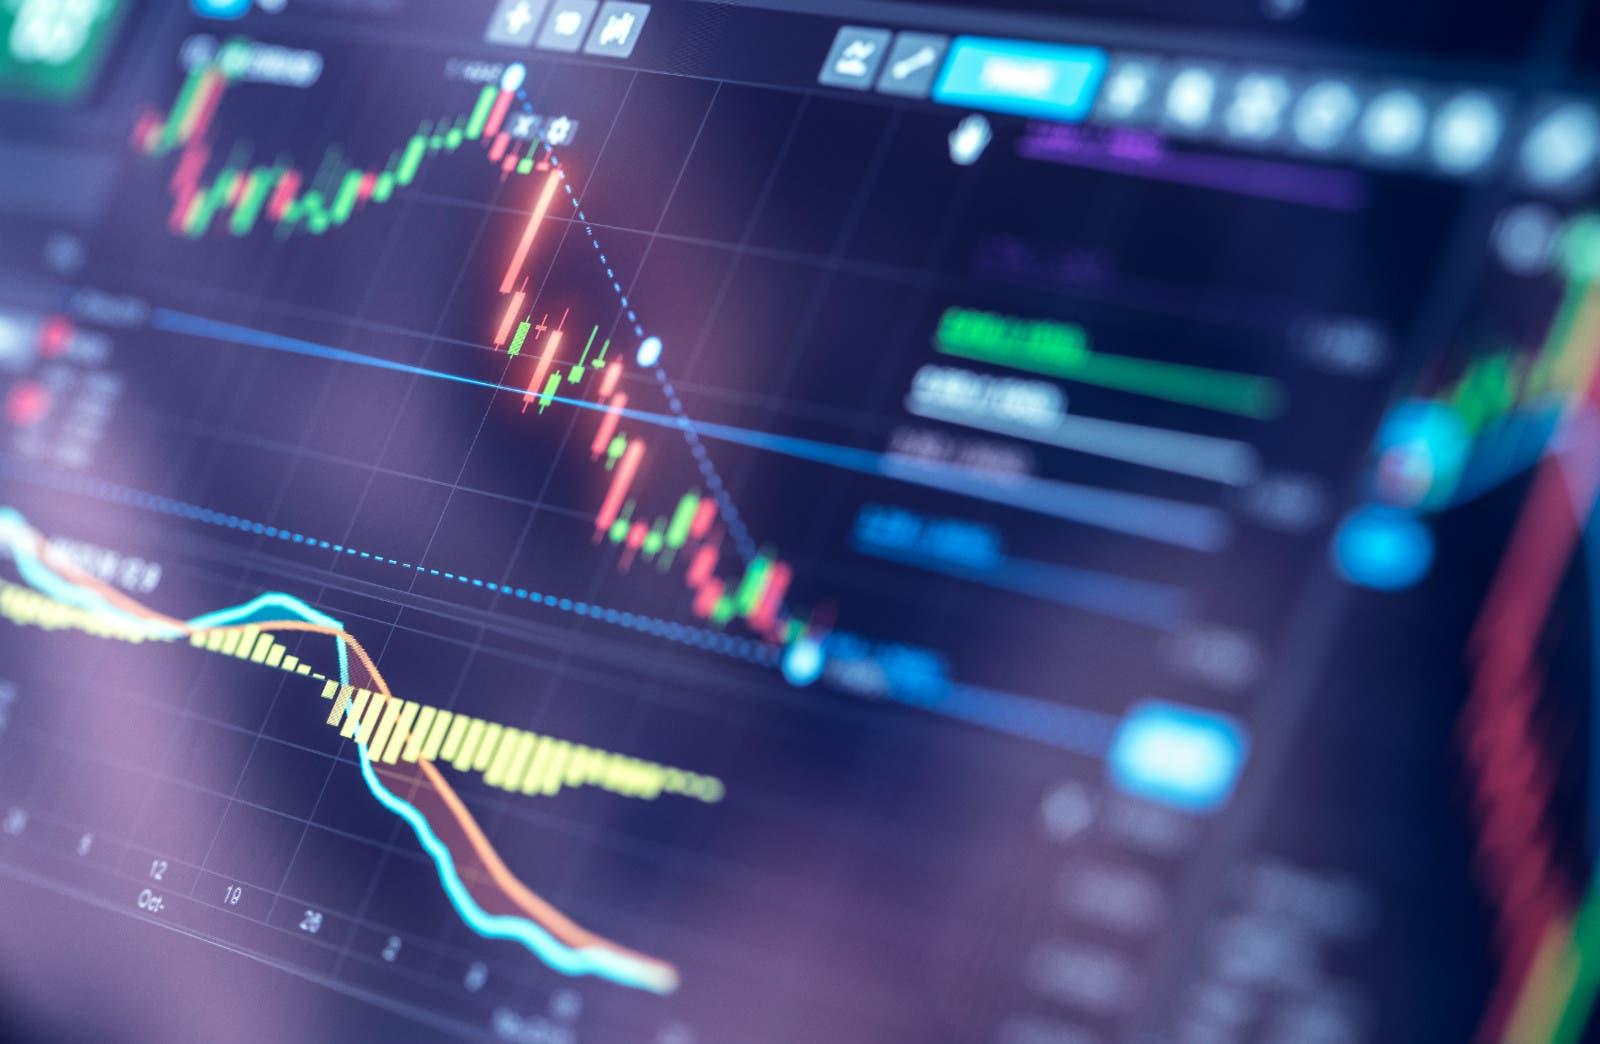 Financial-chart-at-digital-display-871912974_7445x4862_meitu_1.jpg